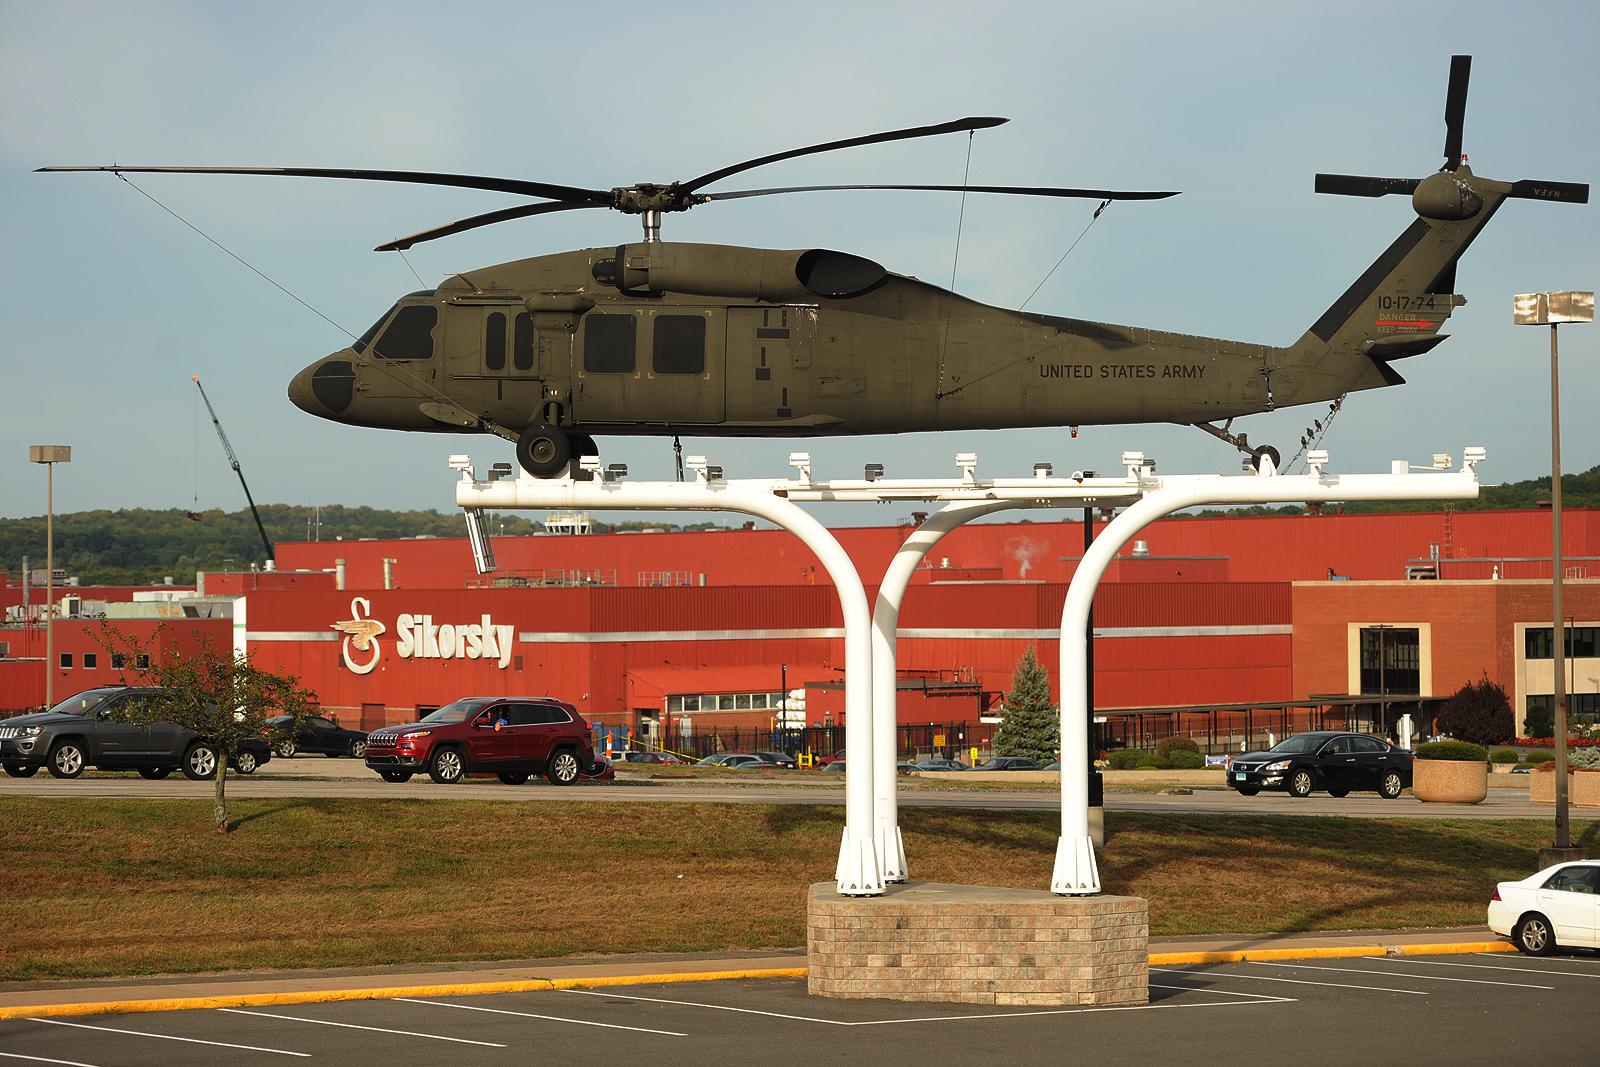 sikorsky delivers 1 000th black hawk helicopter after economic sikorsky delivers 1 000th black hawk helicopter after economic lift from state connecticut post